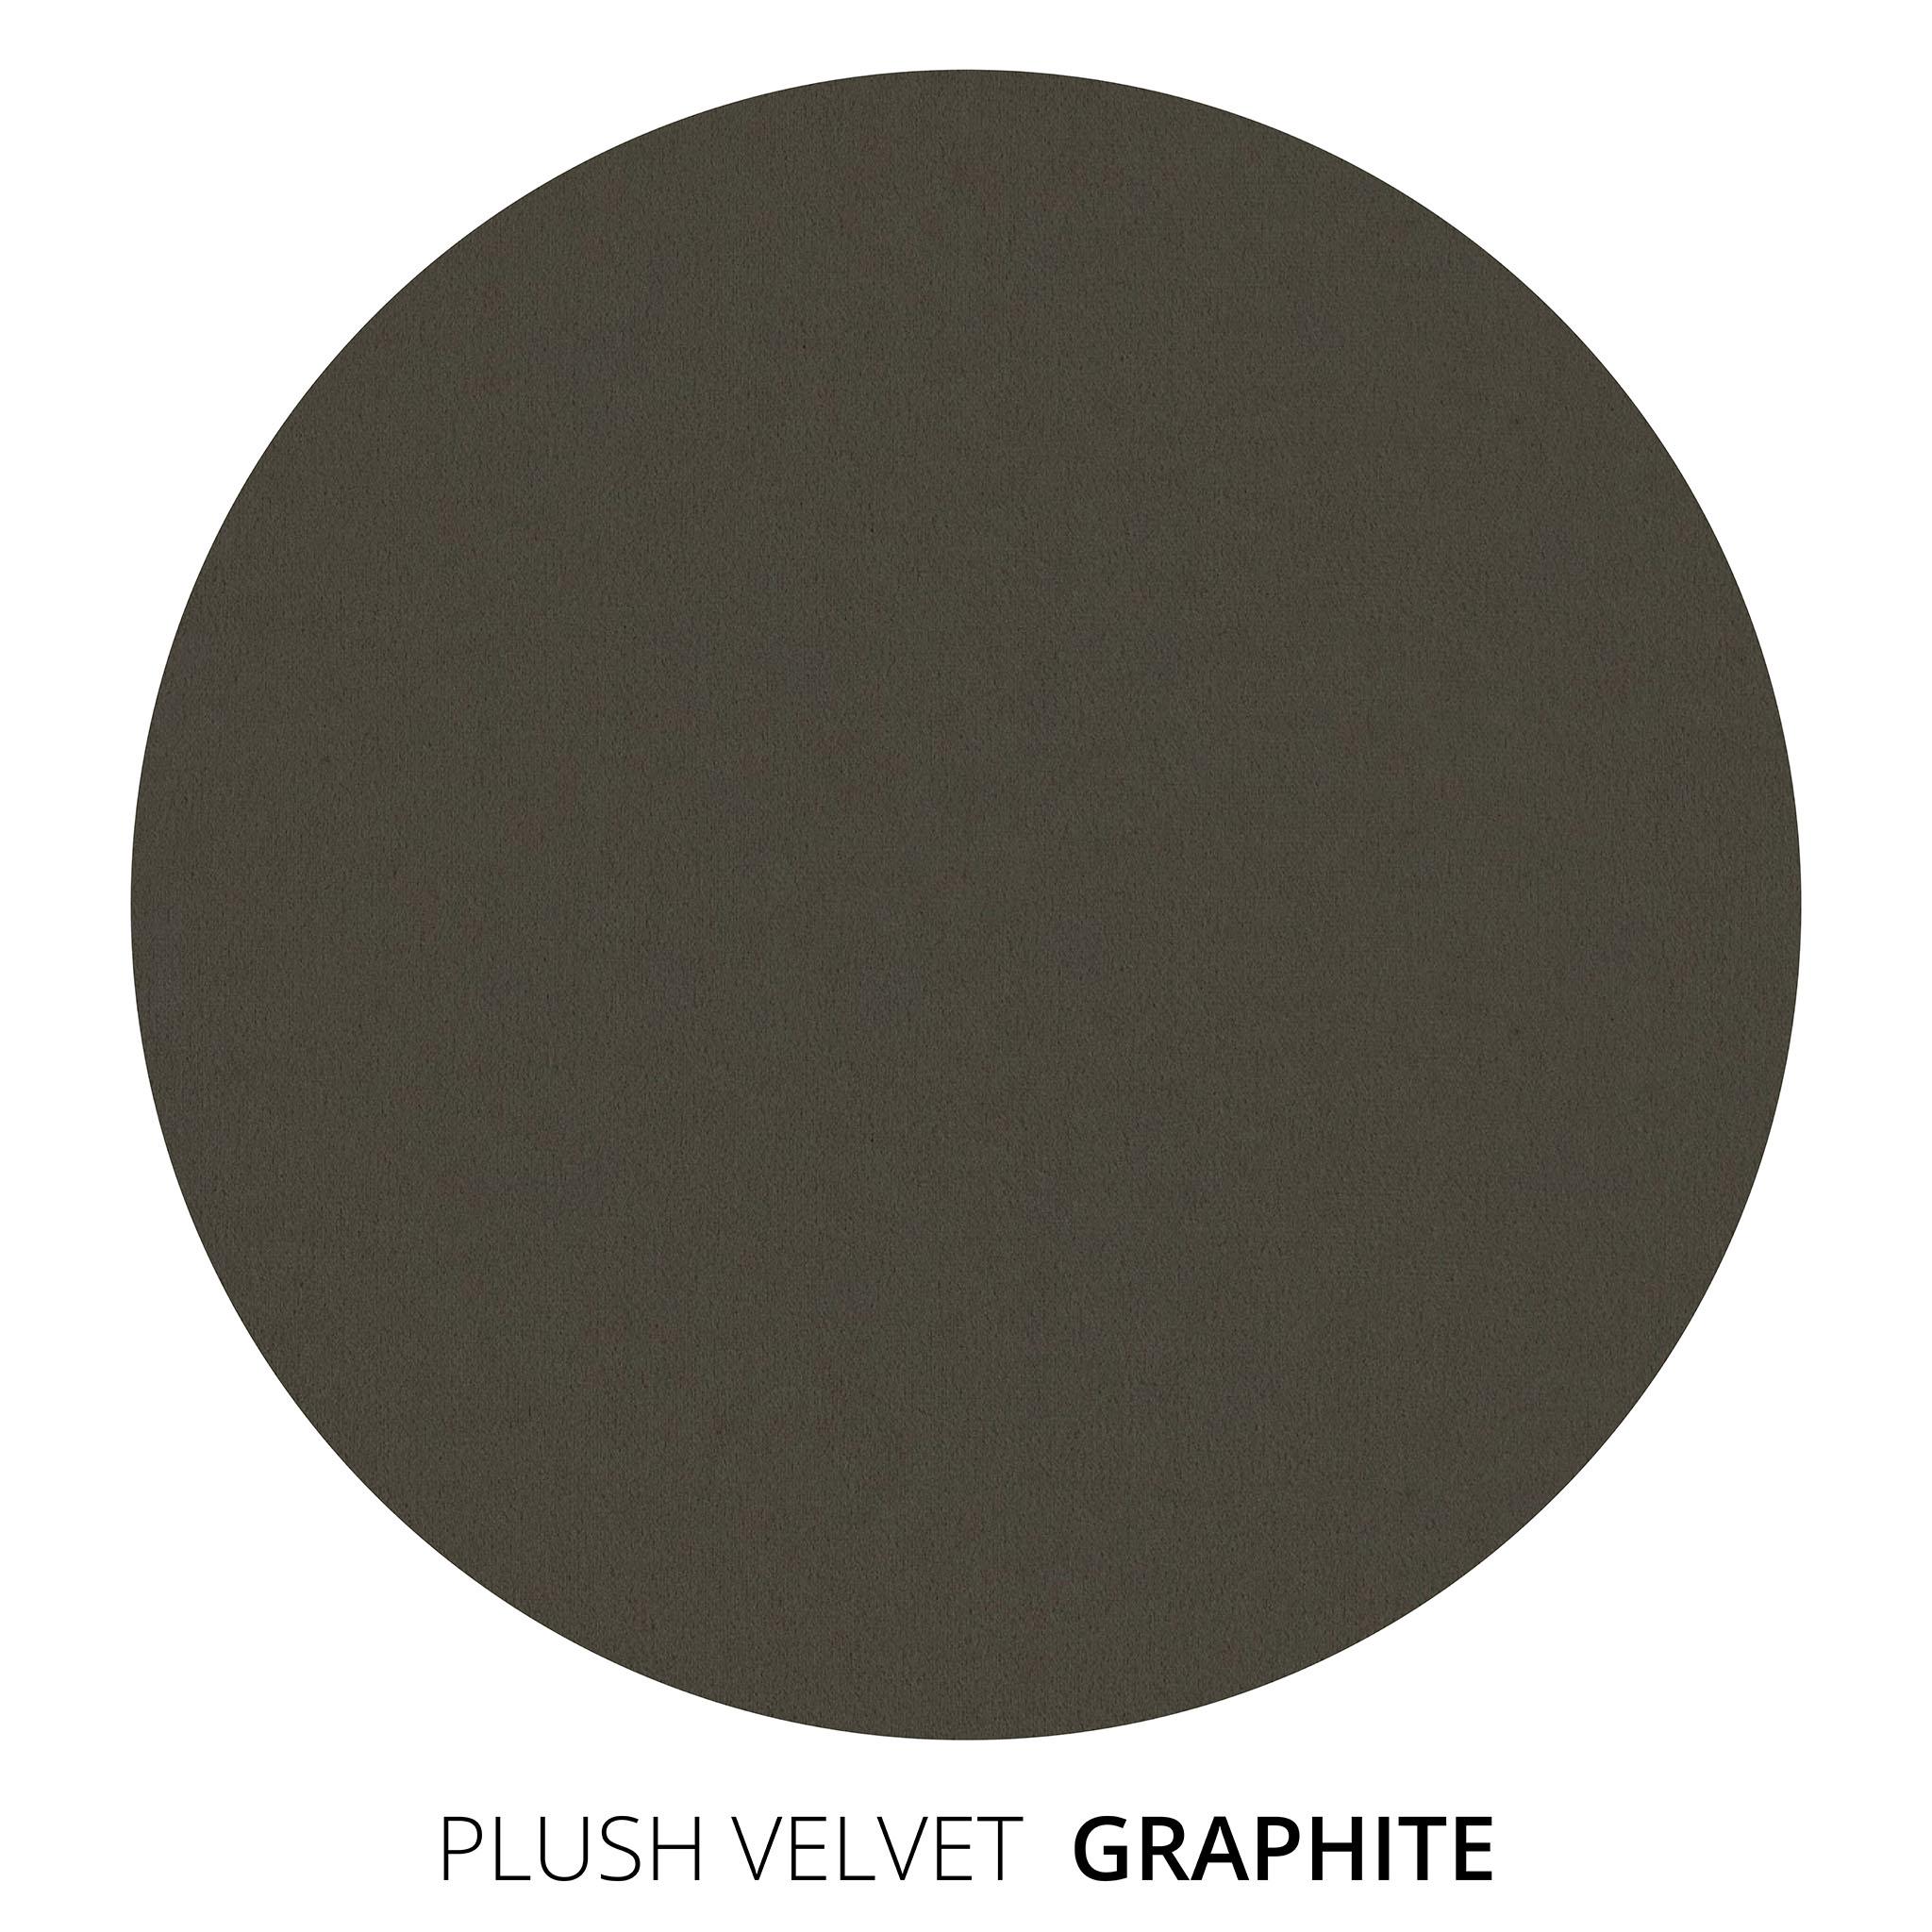 Graphite Plush Velvet Swatch